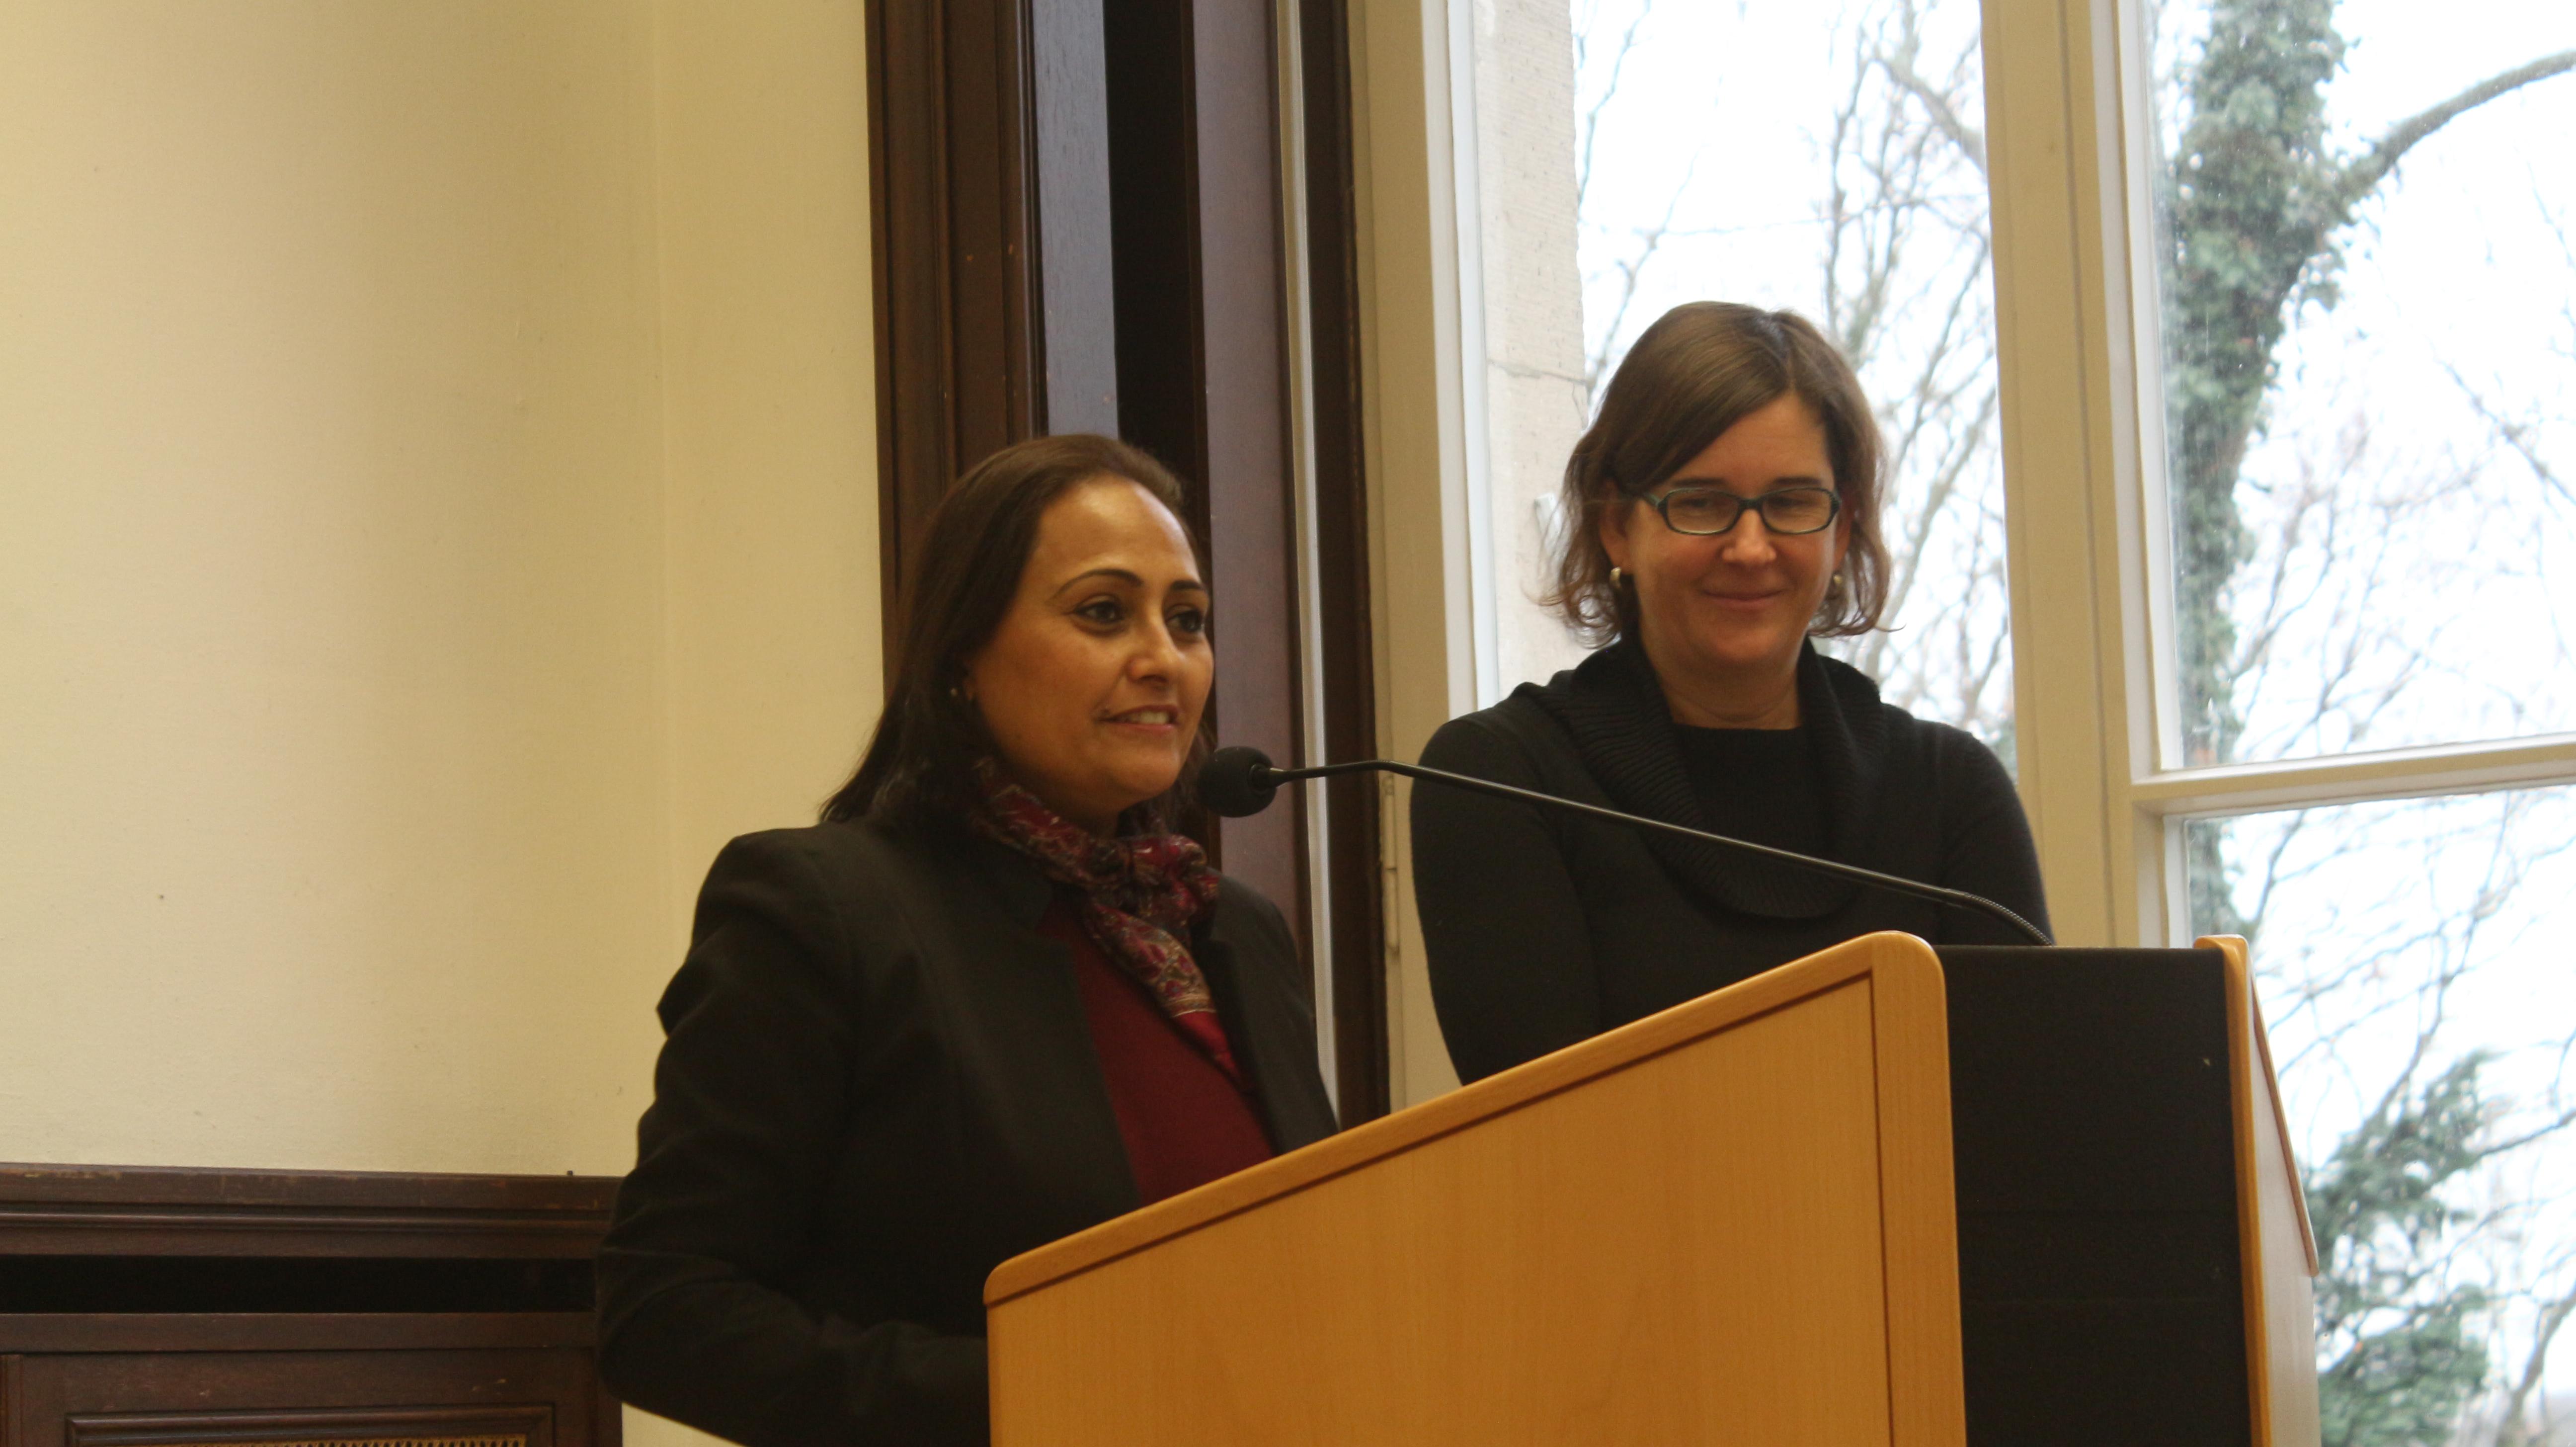 Dr. Amal El-Obeidi and Prof. Dr. Carola Richter